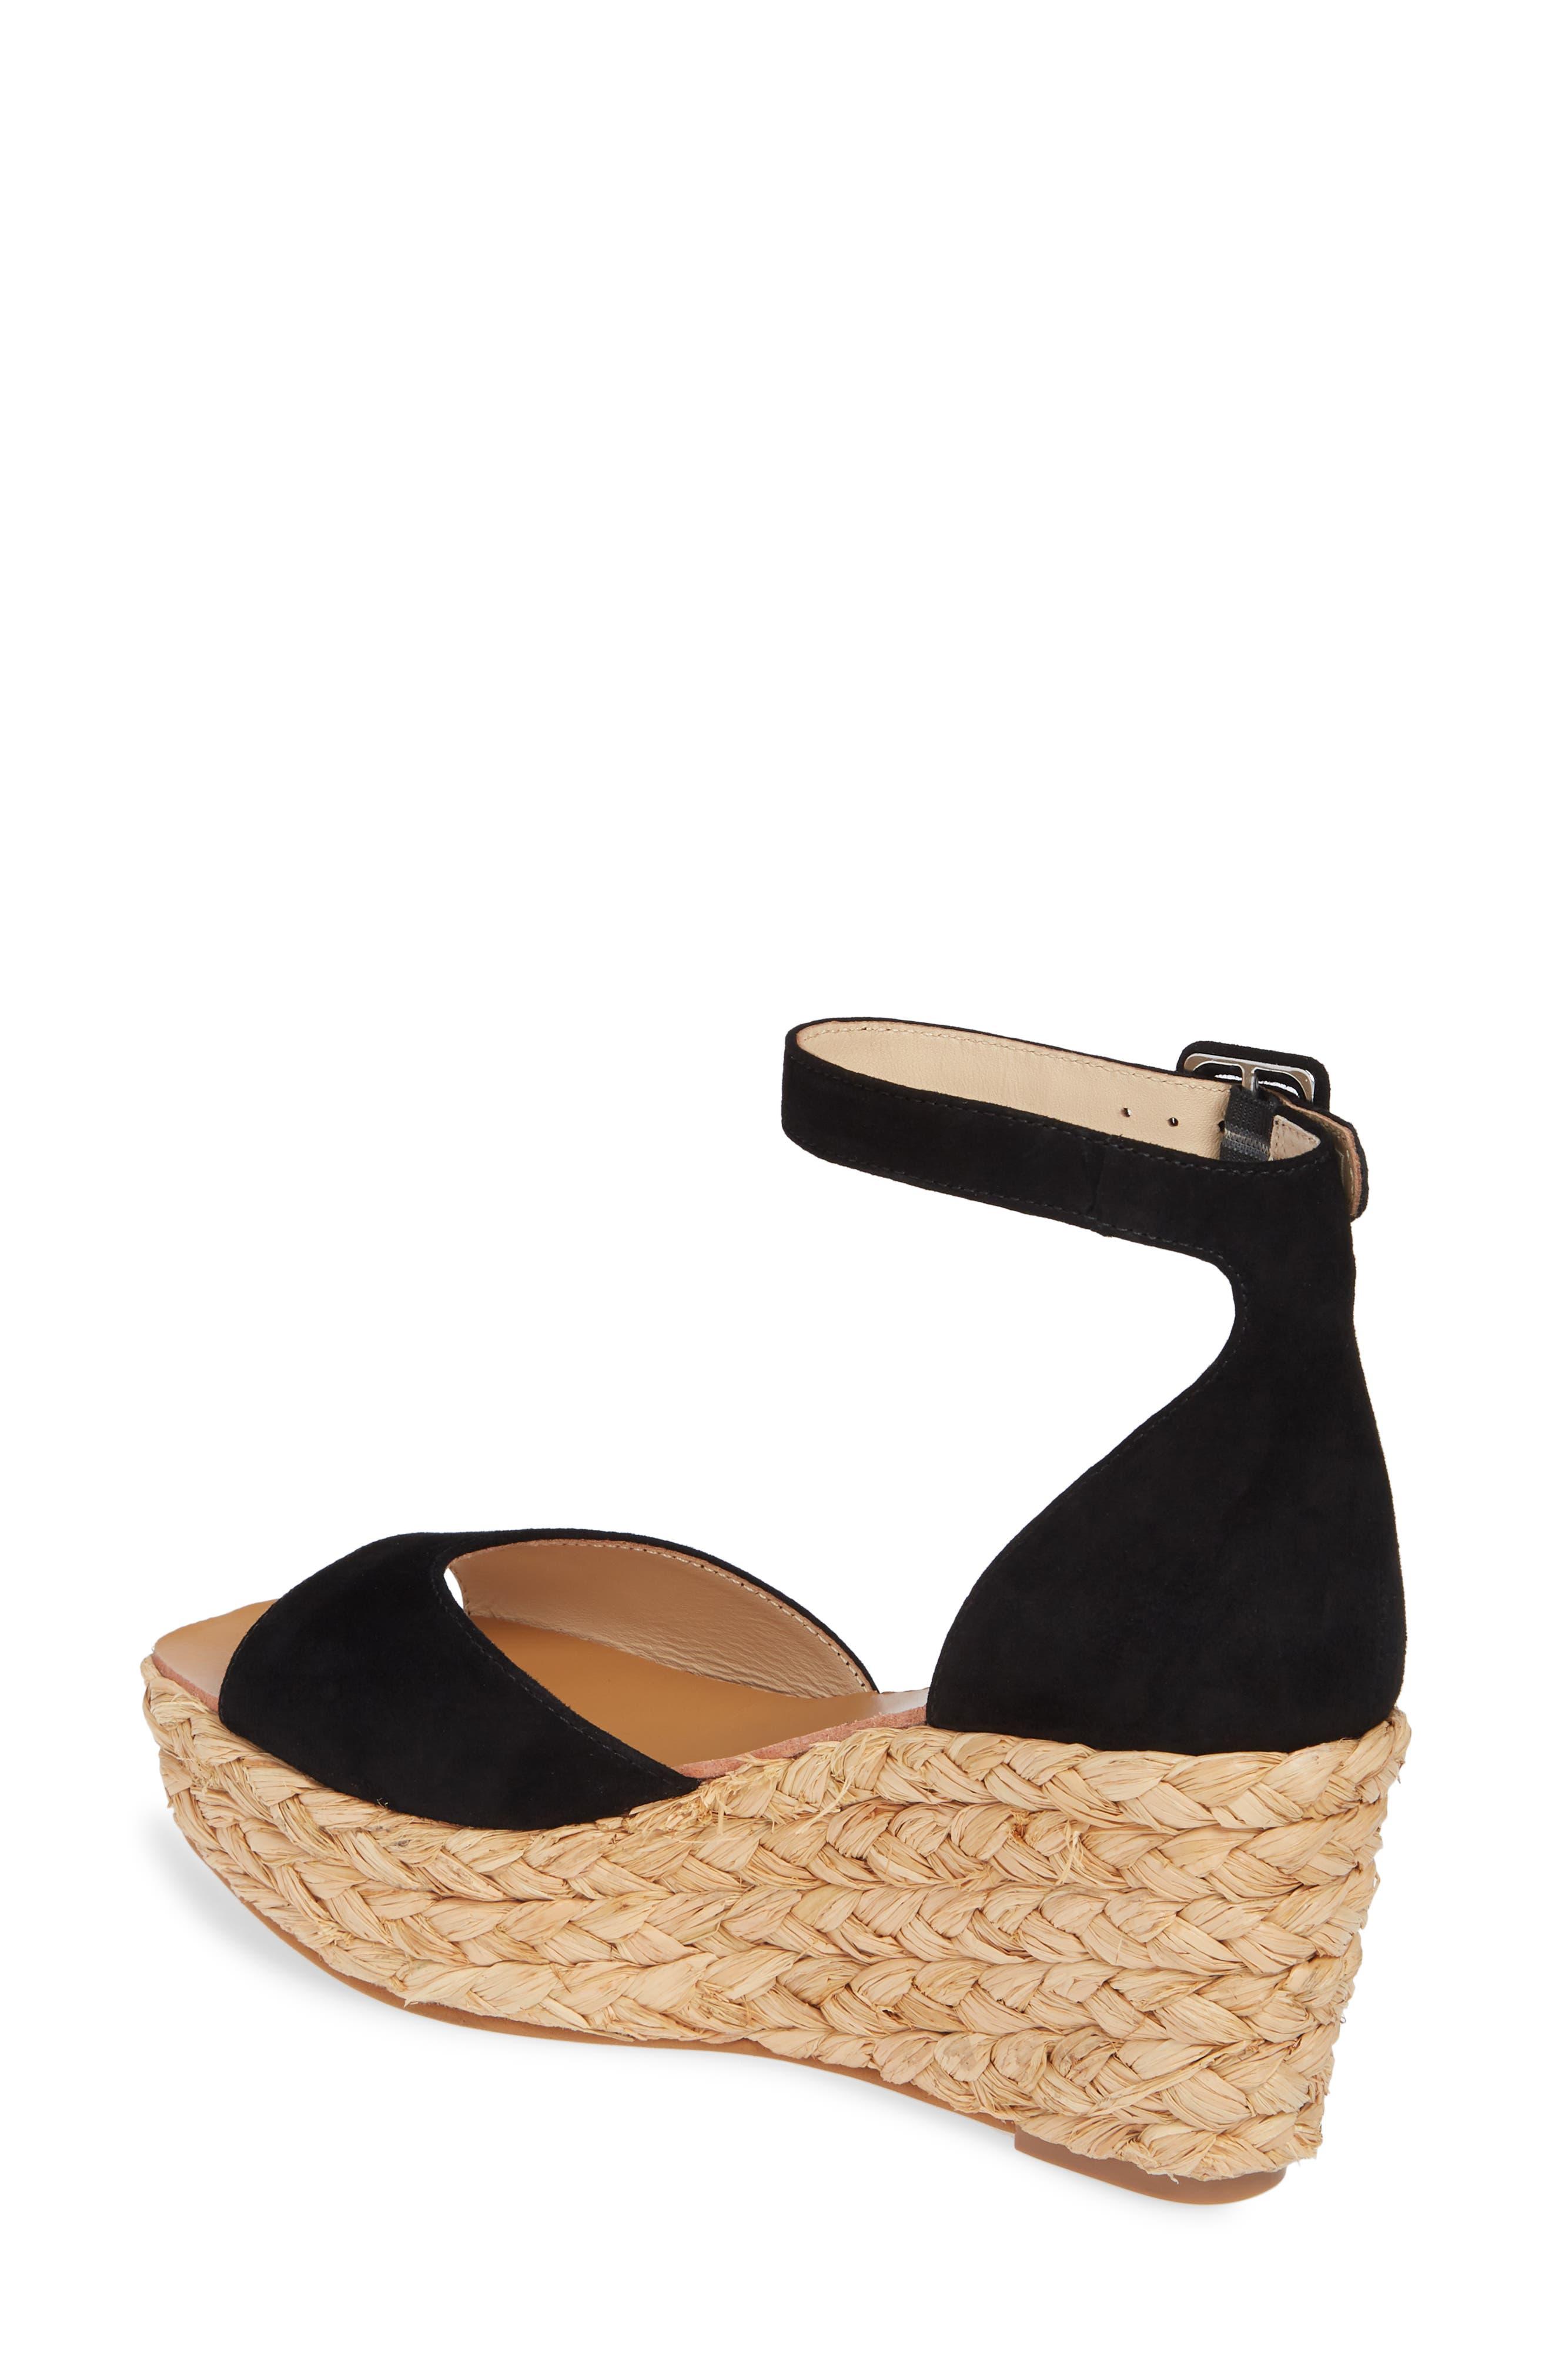 42 GOLD, Mindie Platform Wedge Sandal, Alternate thumbnail 2, color, BLACK SUEDE